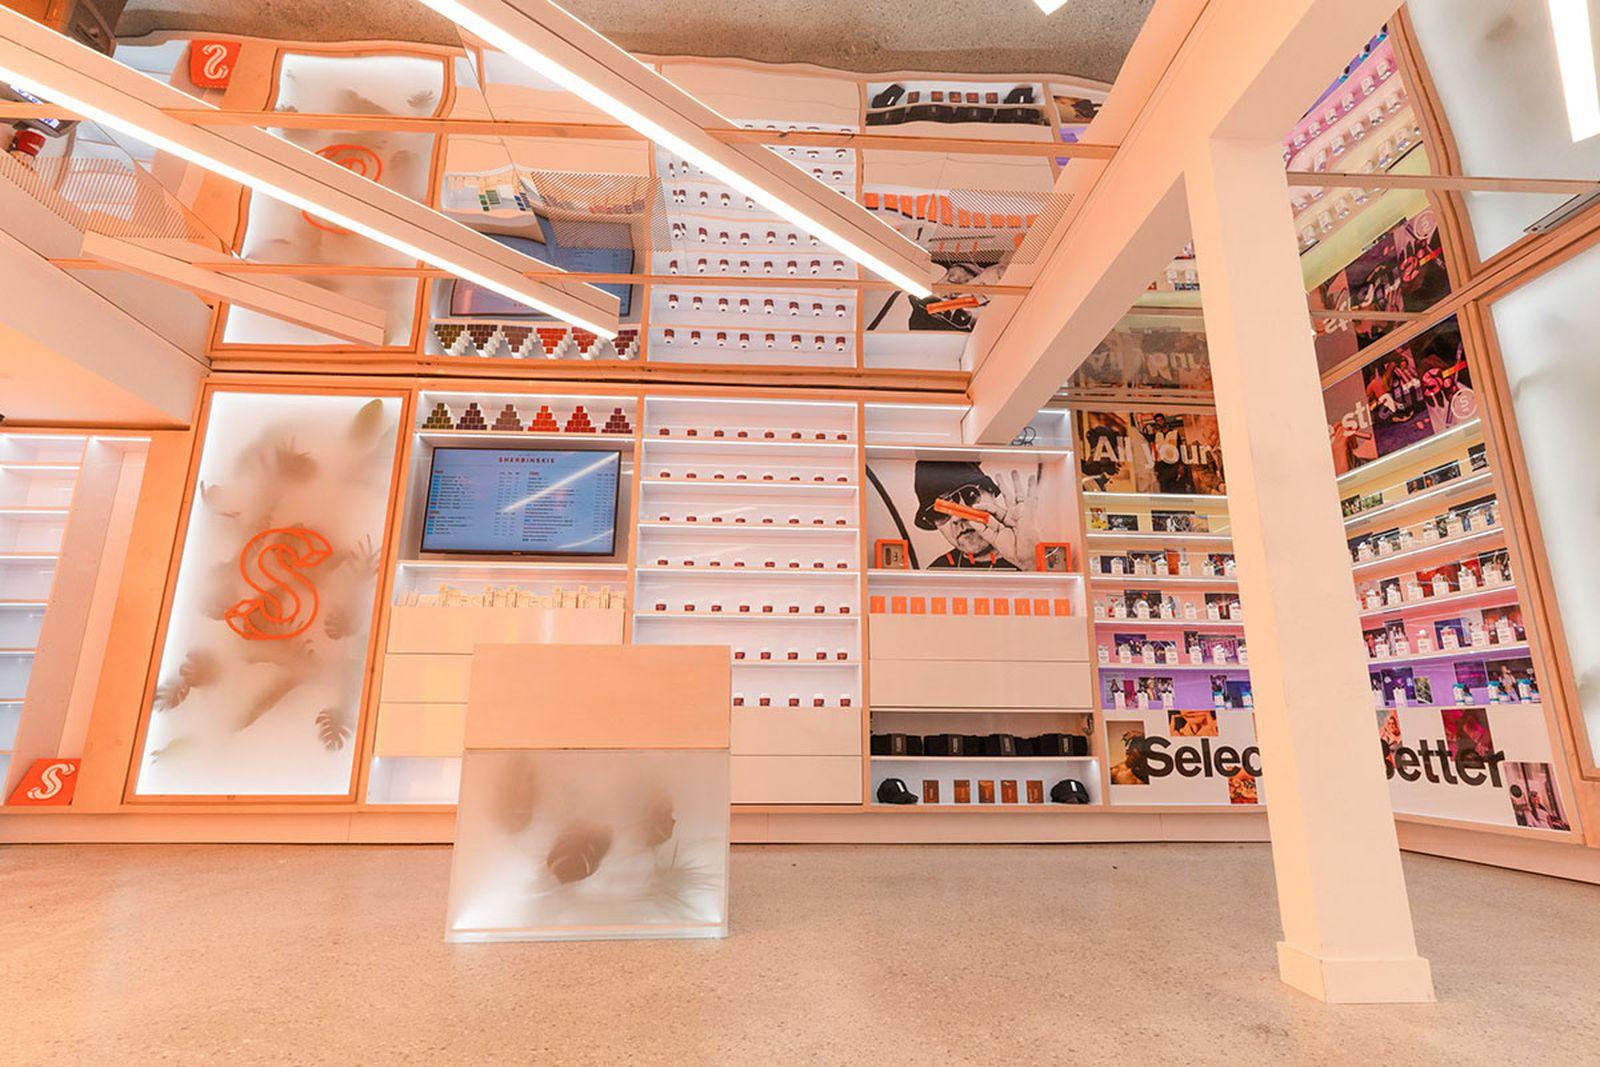 Sherbinskis Los Angeles store